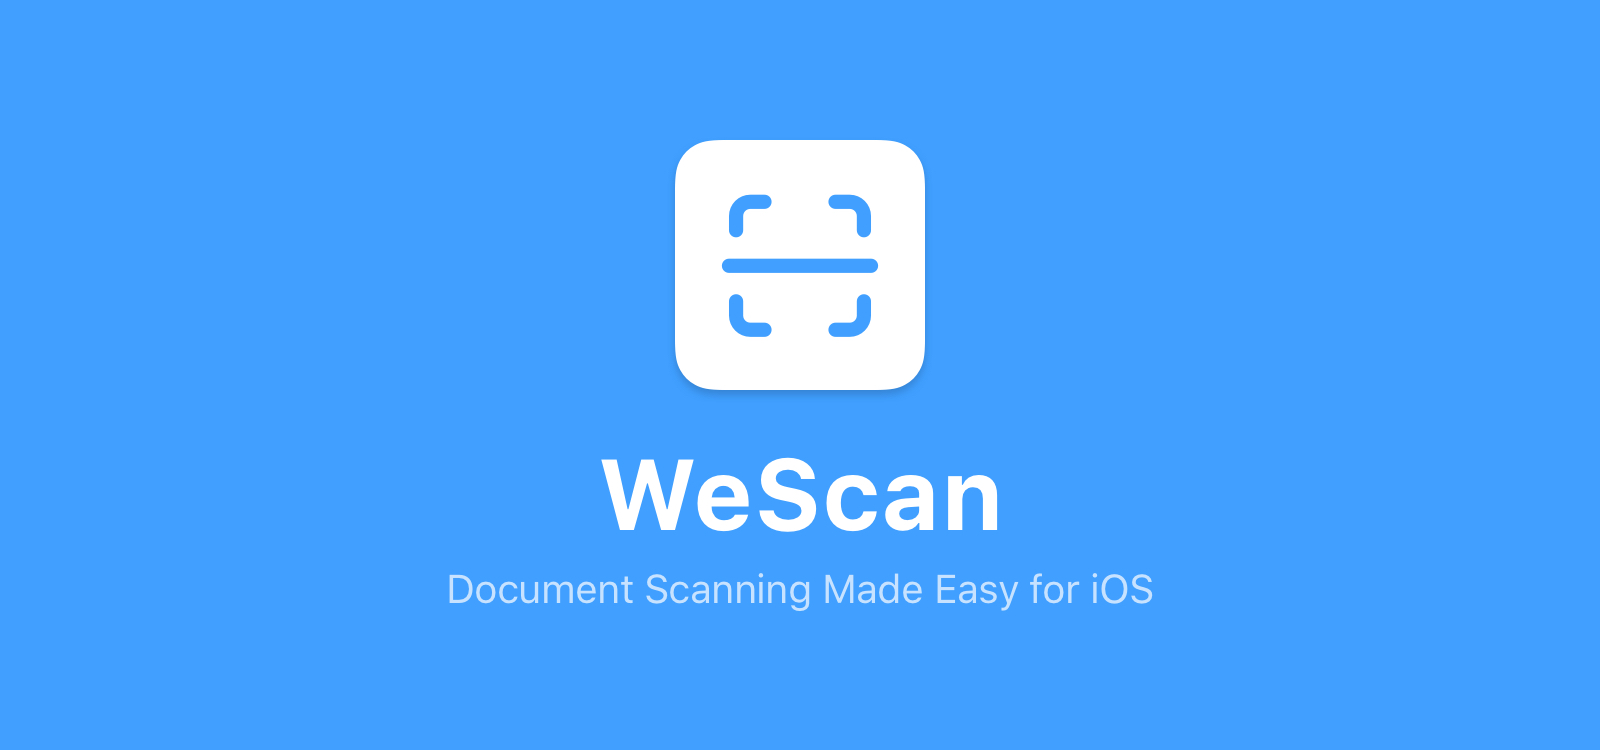 WeScan